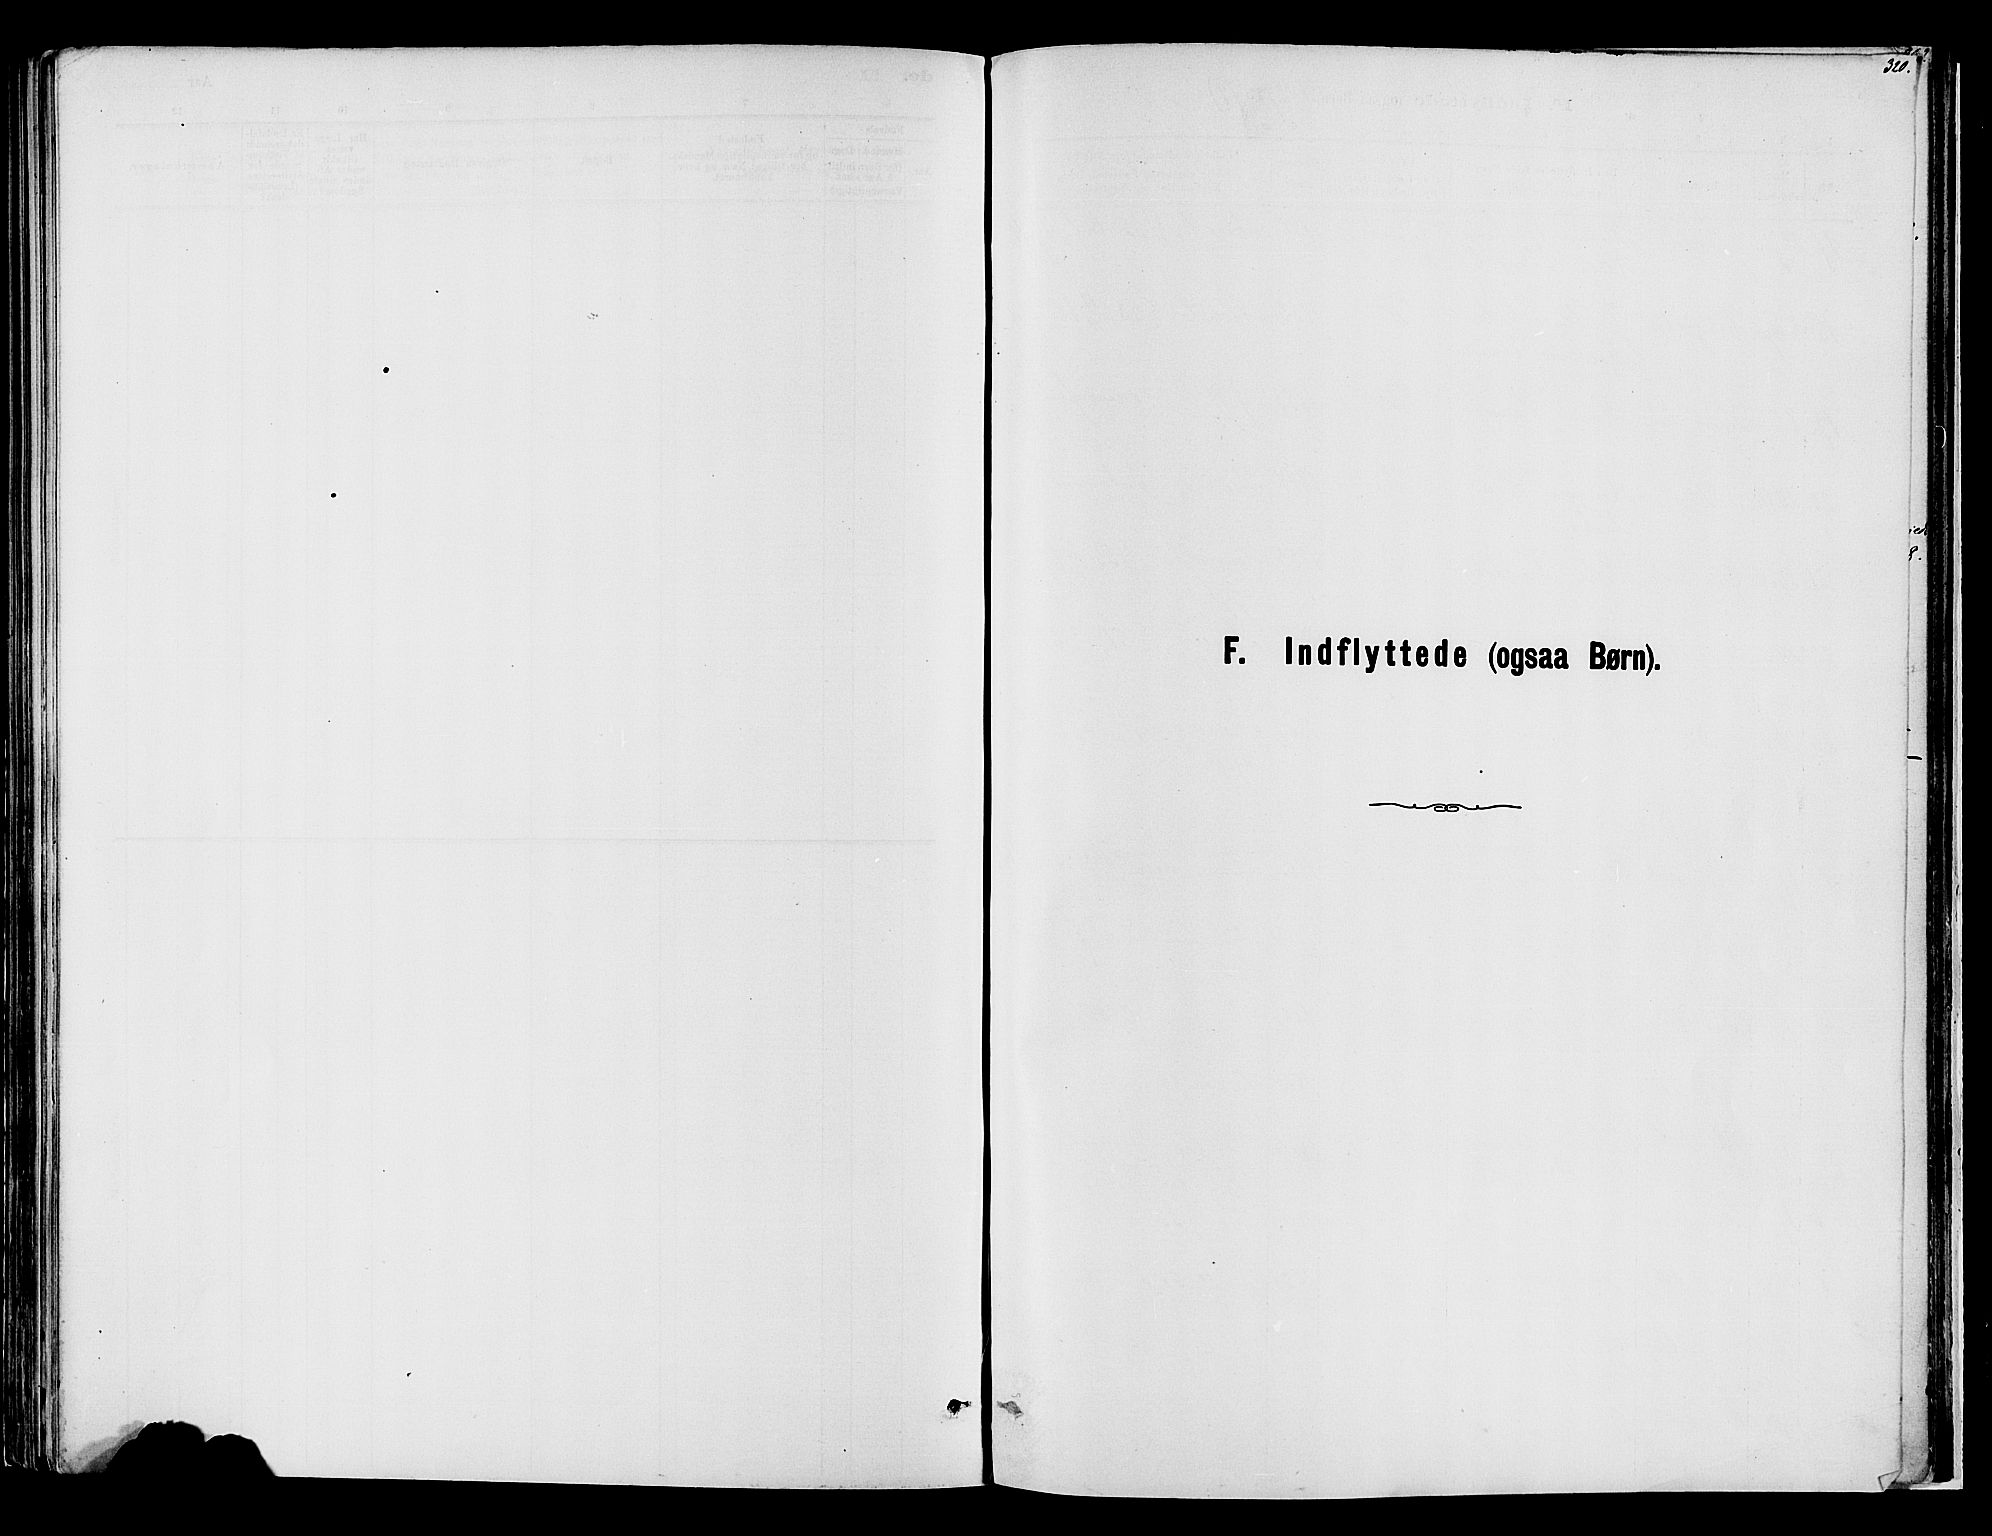 SAH, Vardal prestekontor, H/Ha/Haa/L0008: Ministerialbok nr. 8, 1878-1890, s. 320